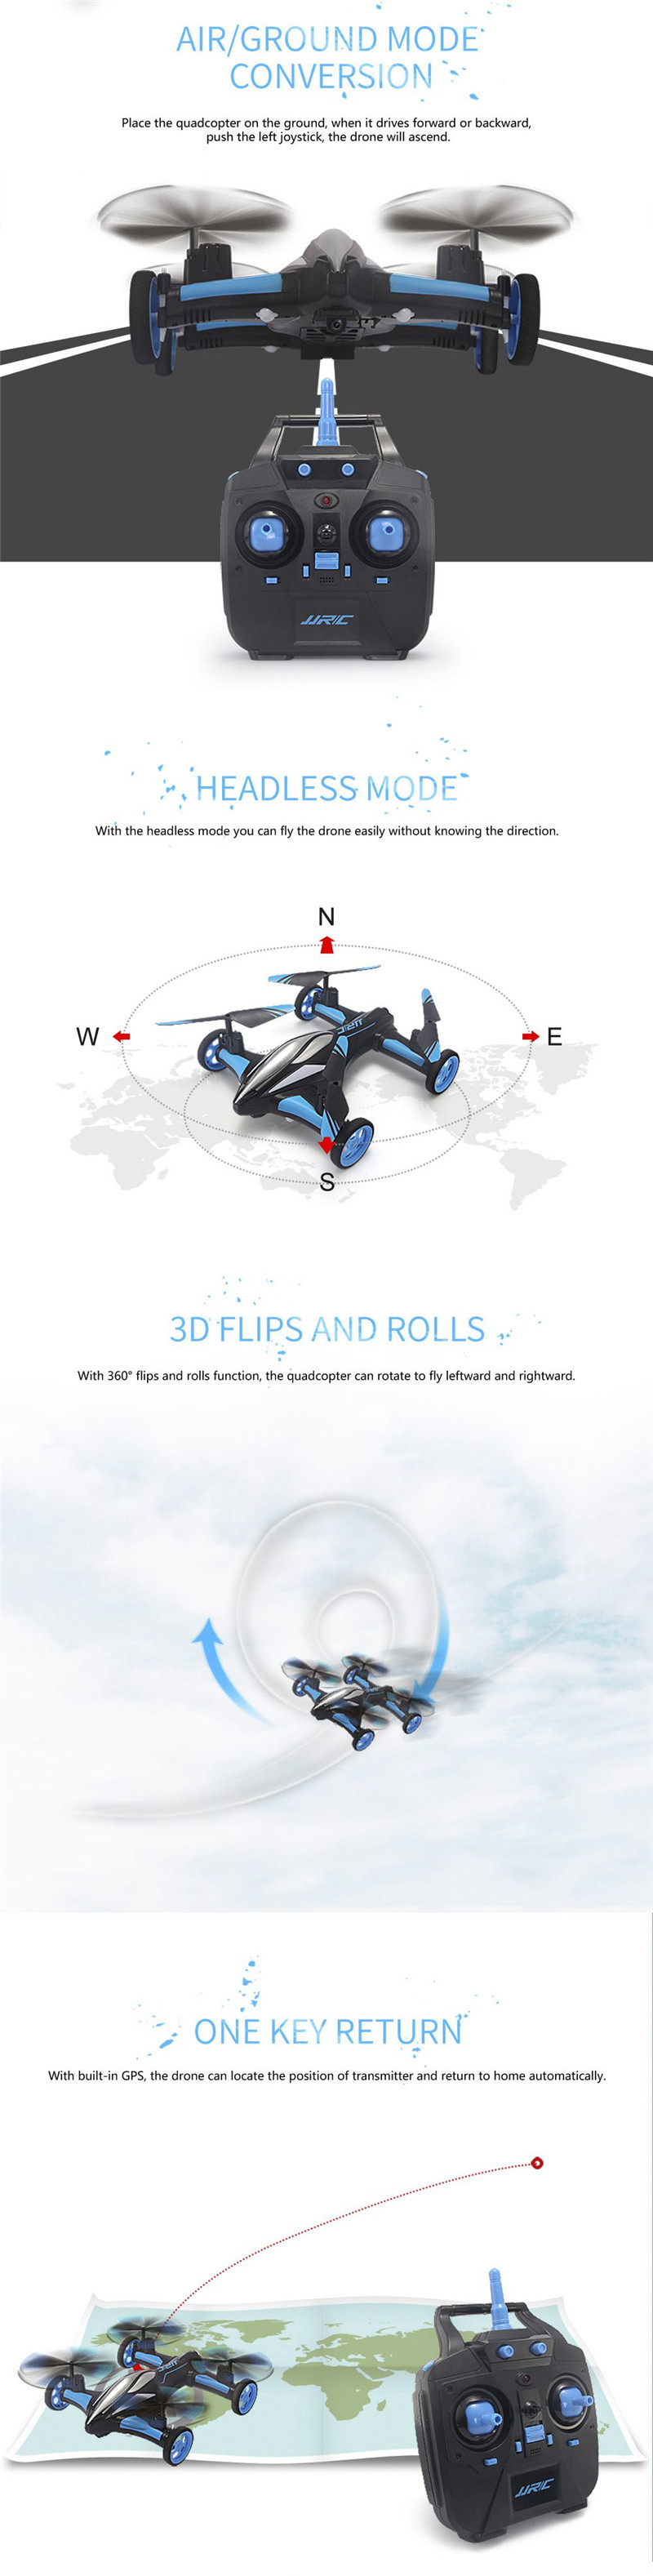 JJRC H23W Air Ground Flying Car 0.3MP Wifi Camera 2.4G 4CH 6Axis 3D Flips One Key Return RC Drone Quadcopter Toy RTF